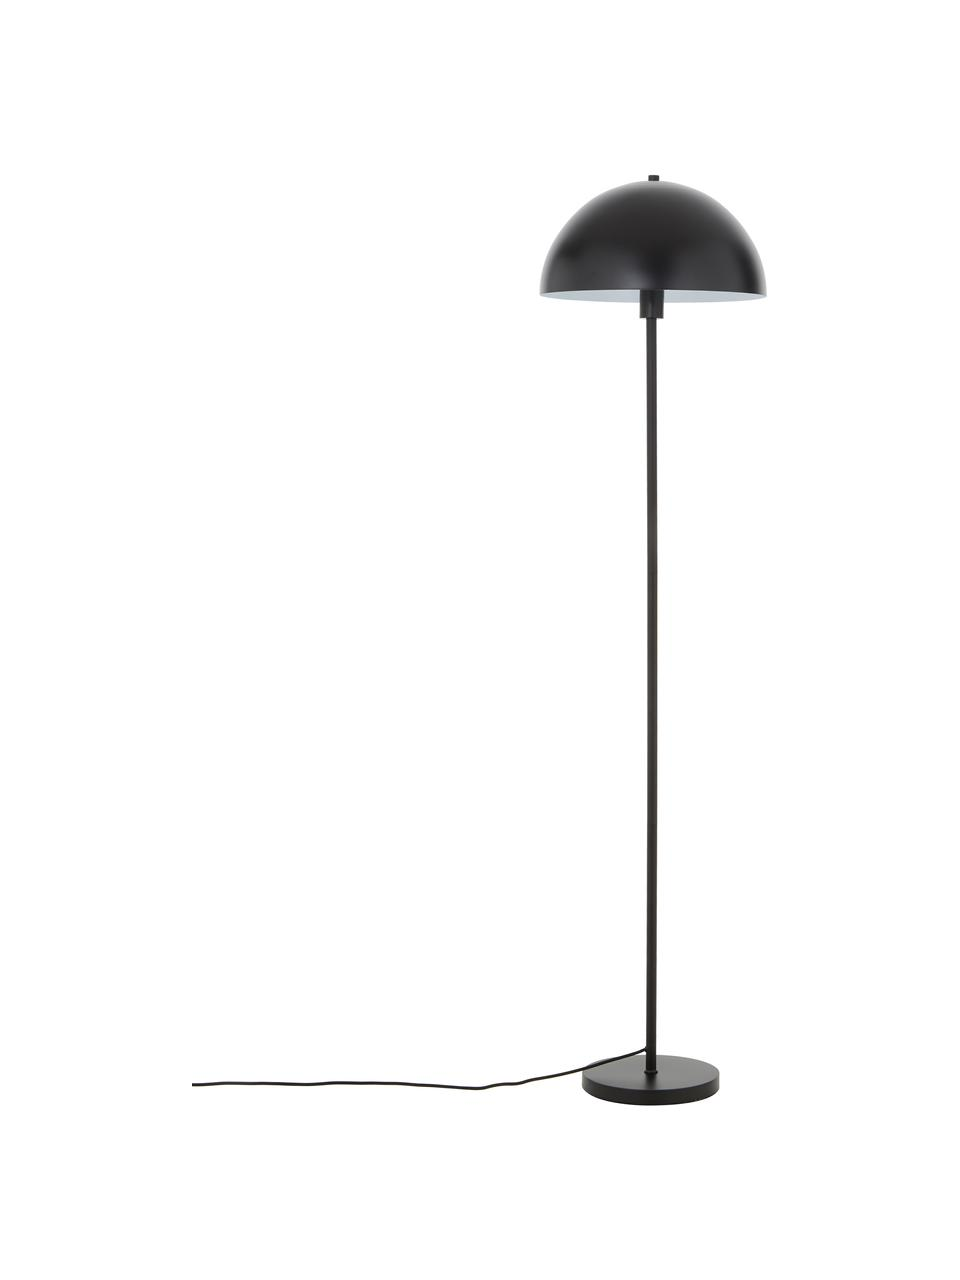 Vloerlamp Matilda in zwart, Lampenkap: gepoedercoat metaal, Lampvoet: gepoedercoat metaal, Zwart, Ø 40 x H 164 cm